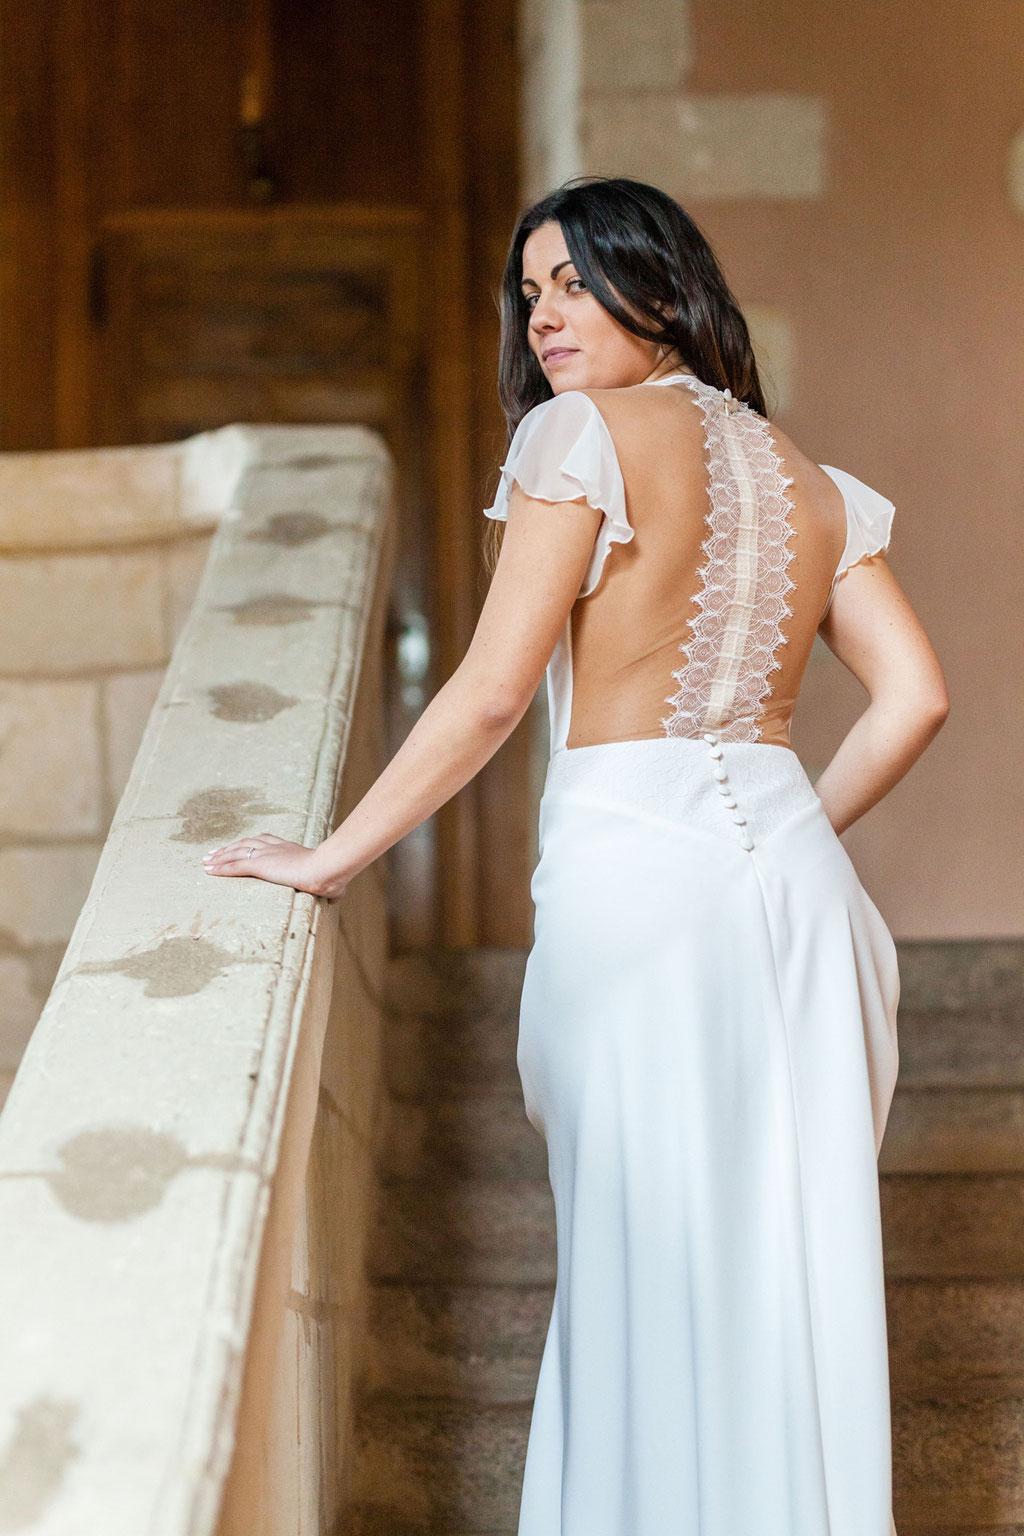 photographe mariage nantes vendée Orlane Boisard